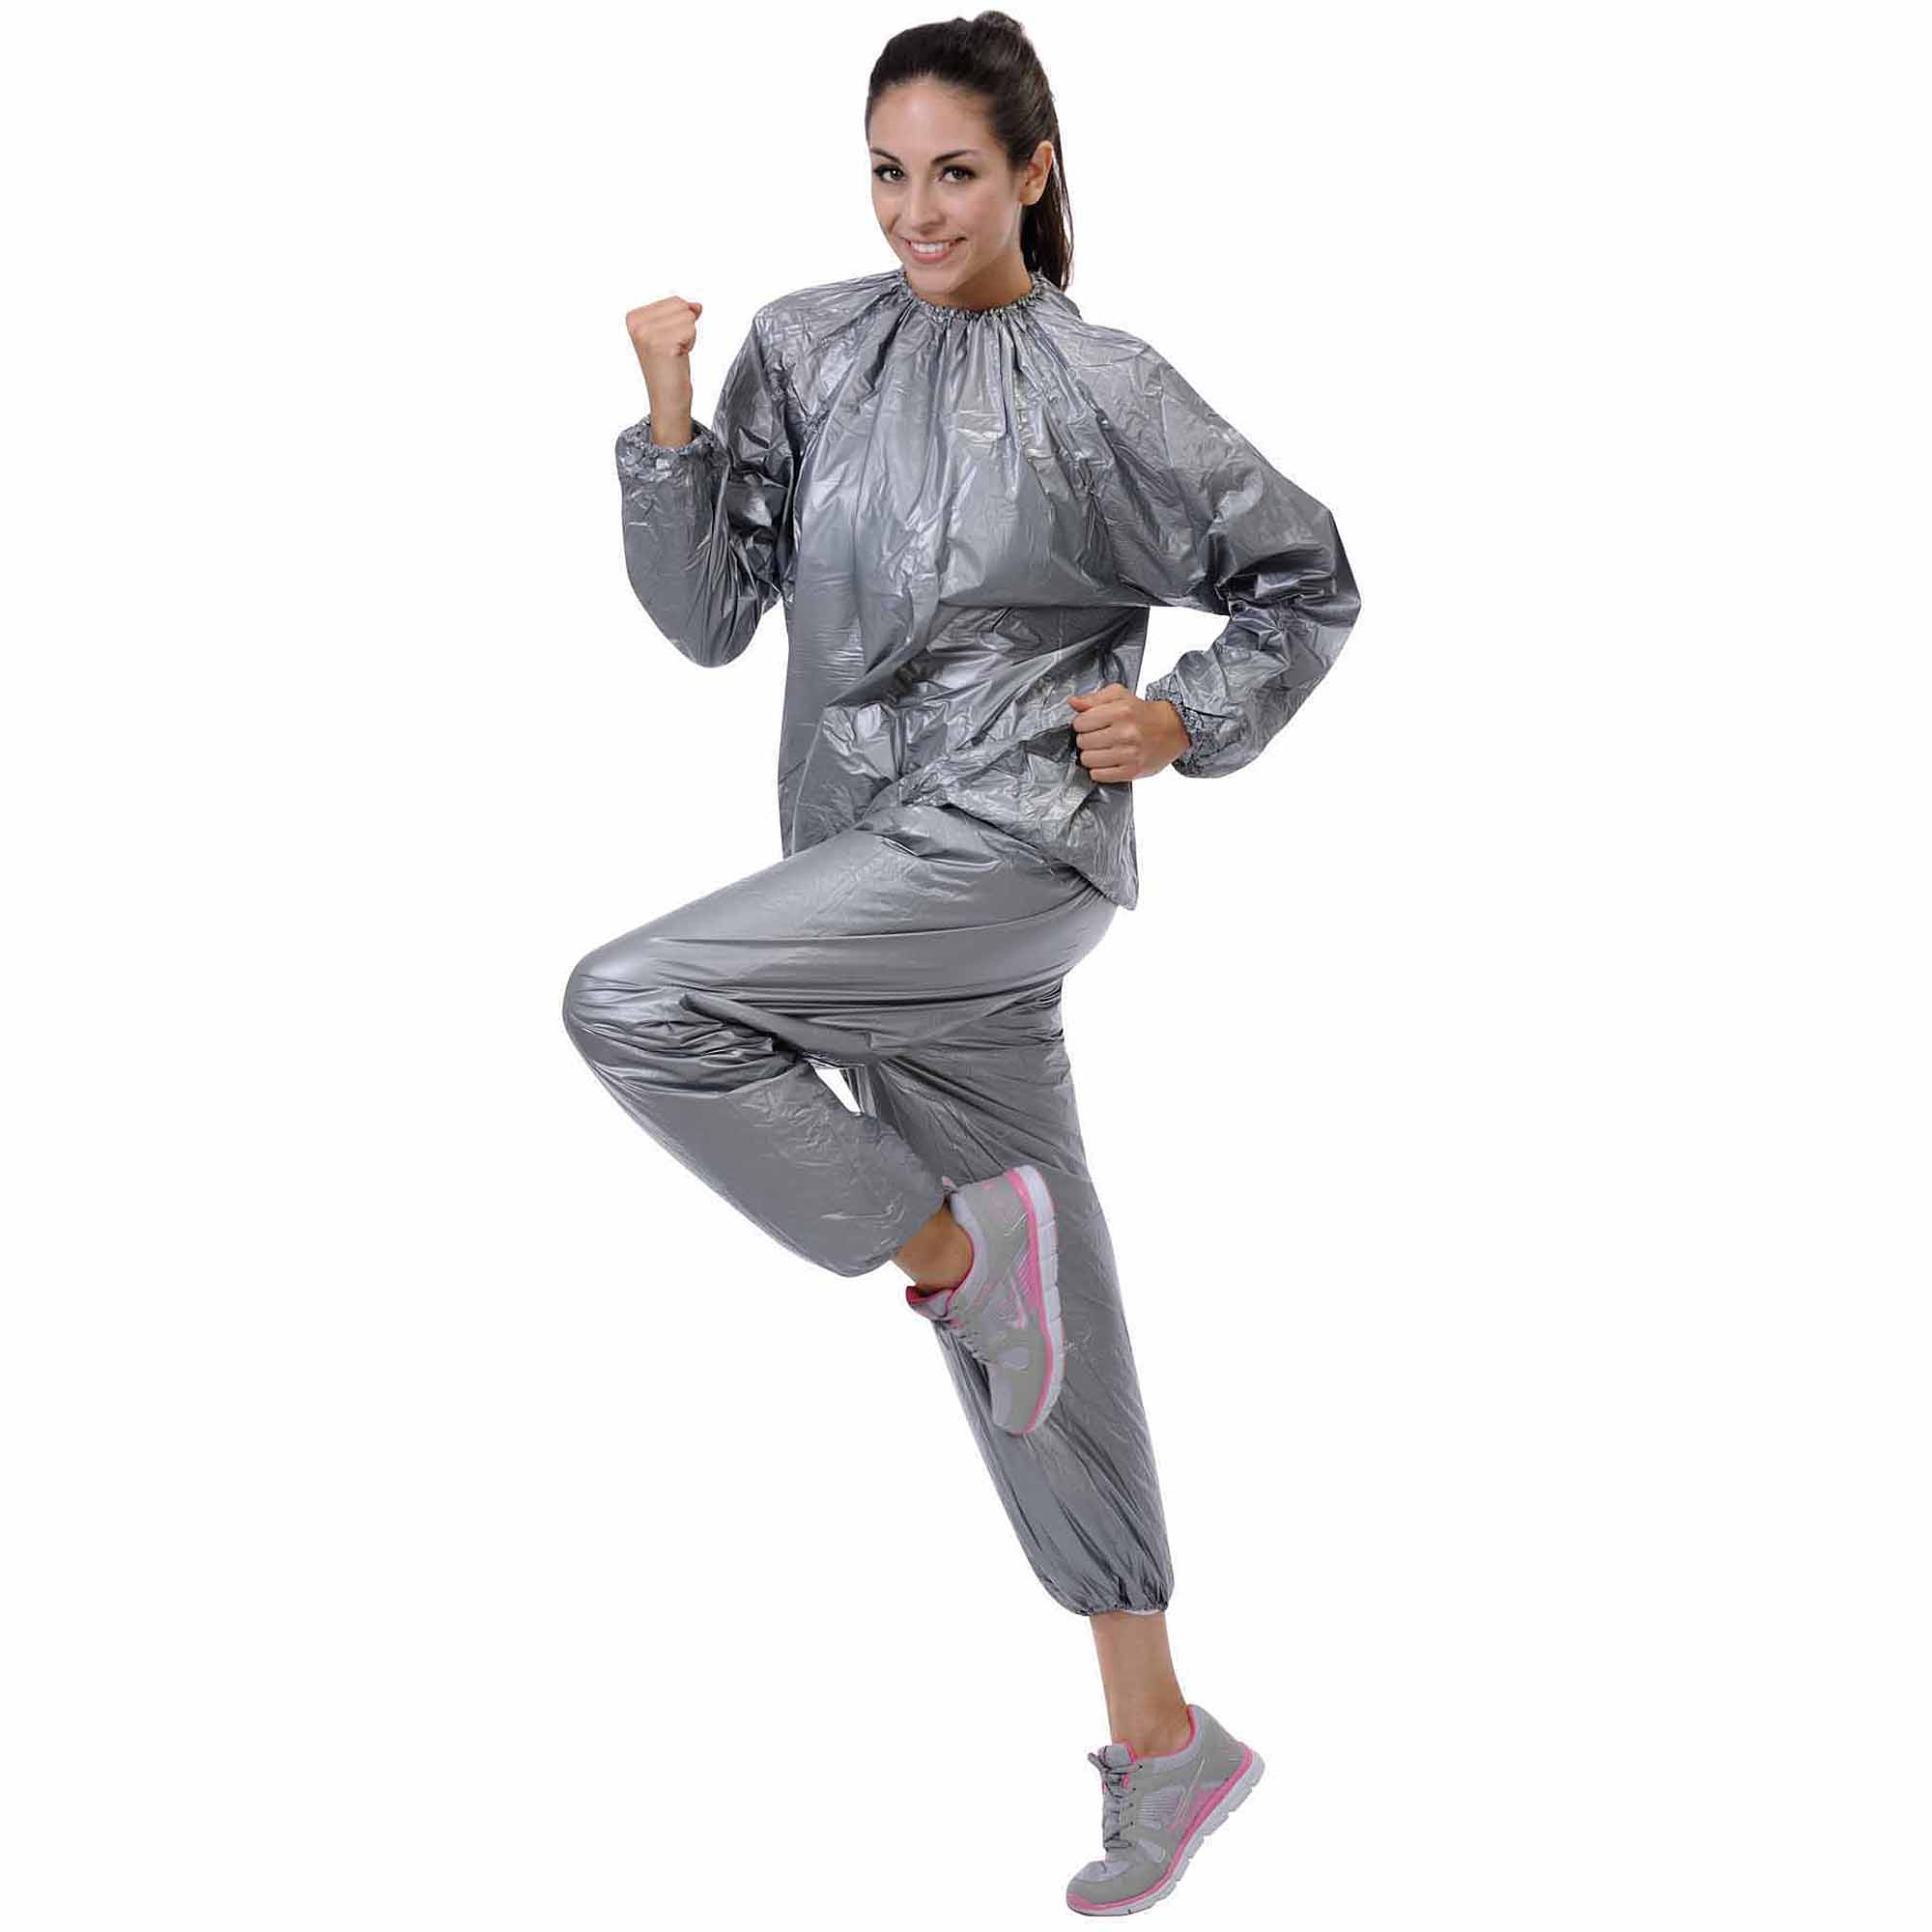 Sunny Health and Fitness Sauna Suit